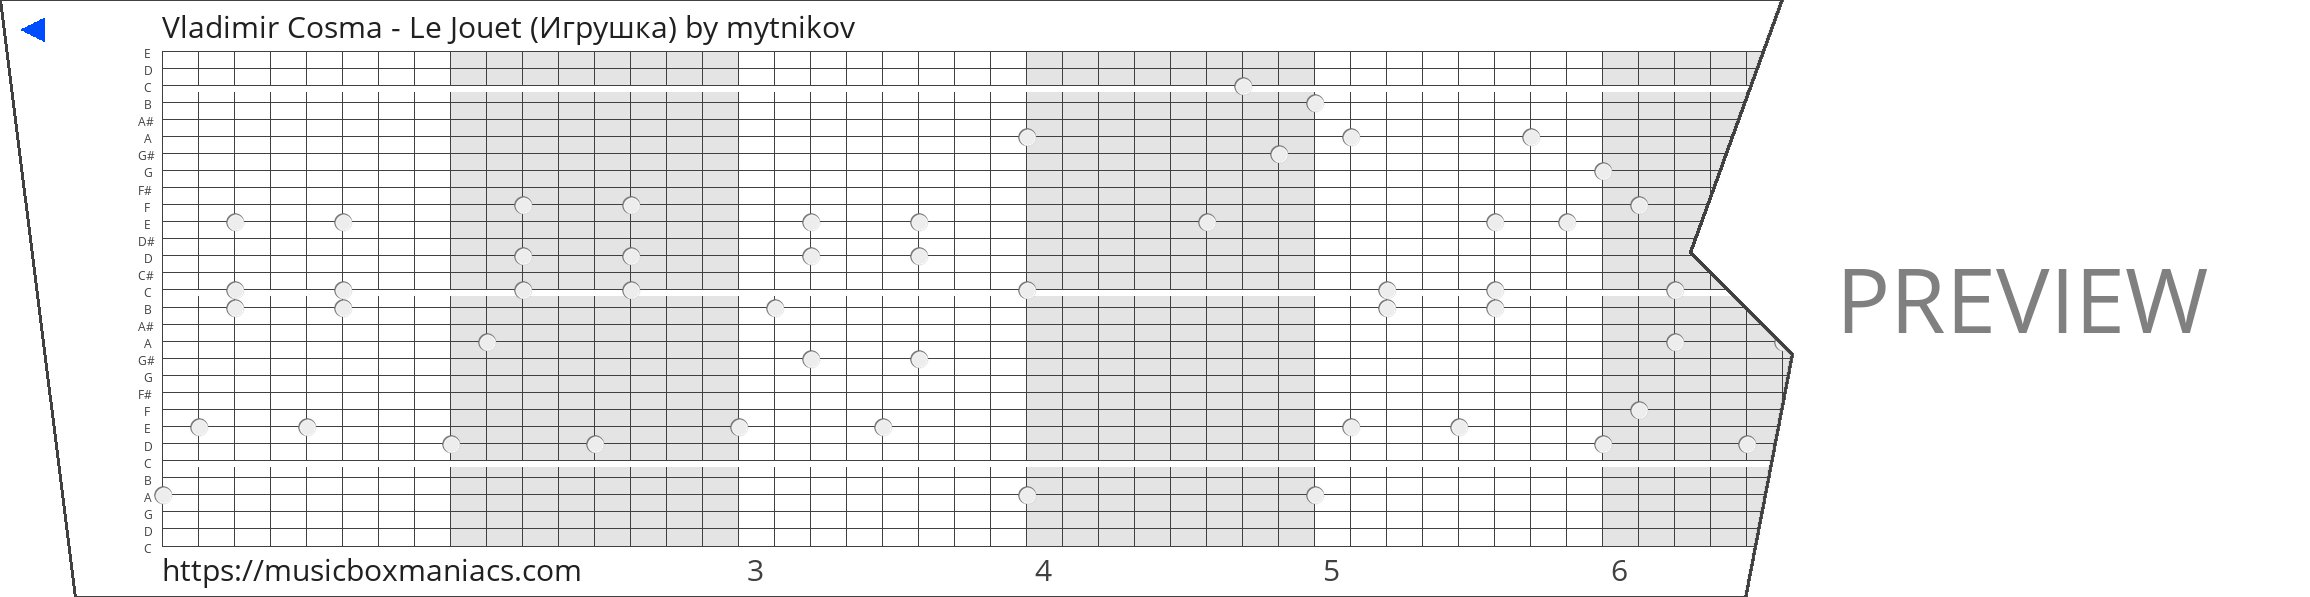 Vladimir Cosma - Le Jouet (Игрушка) 30 note music box paper strip